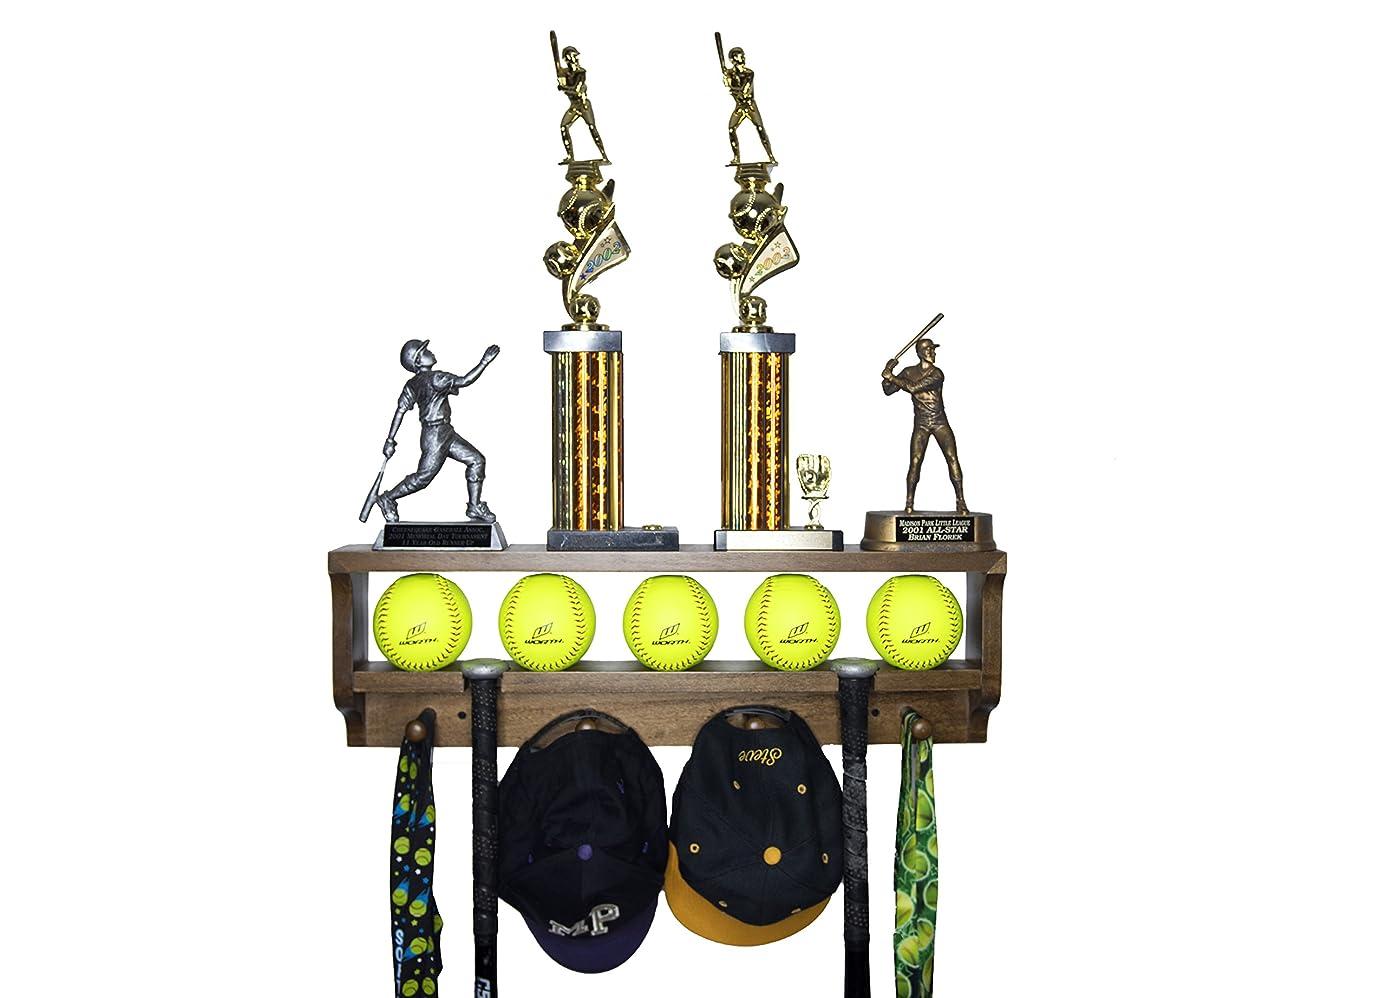 MedalAwardsRack Premier Baseball/Softball Accessory Display Rack and Baseball Trophy Shelf